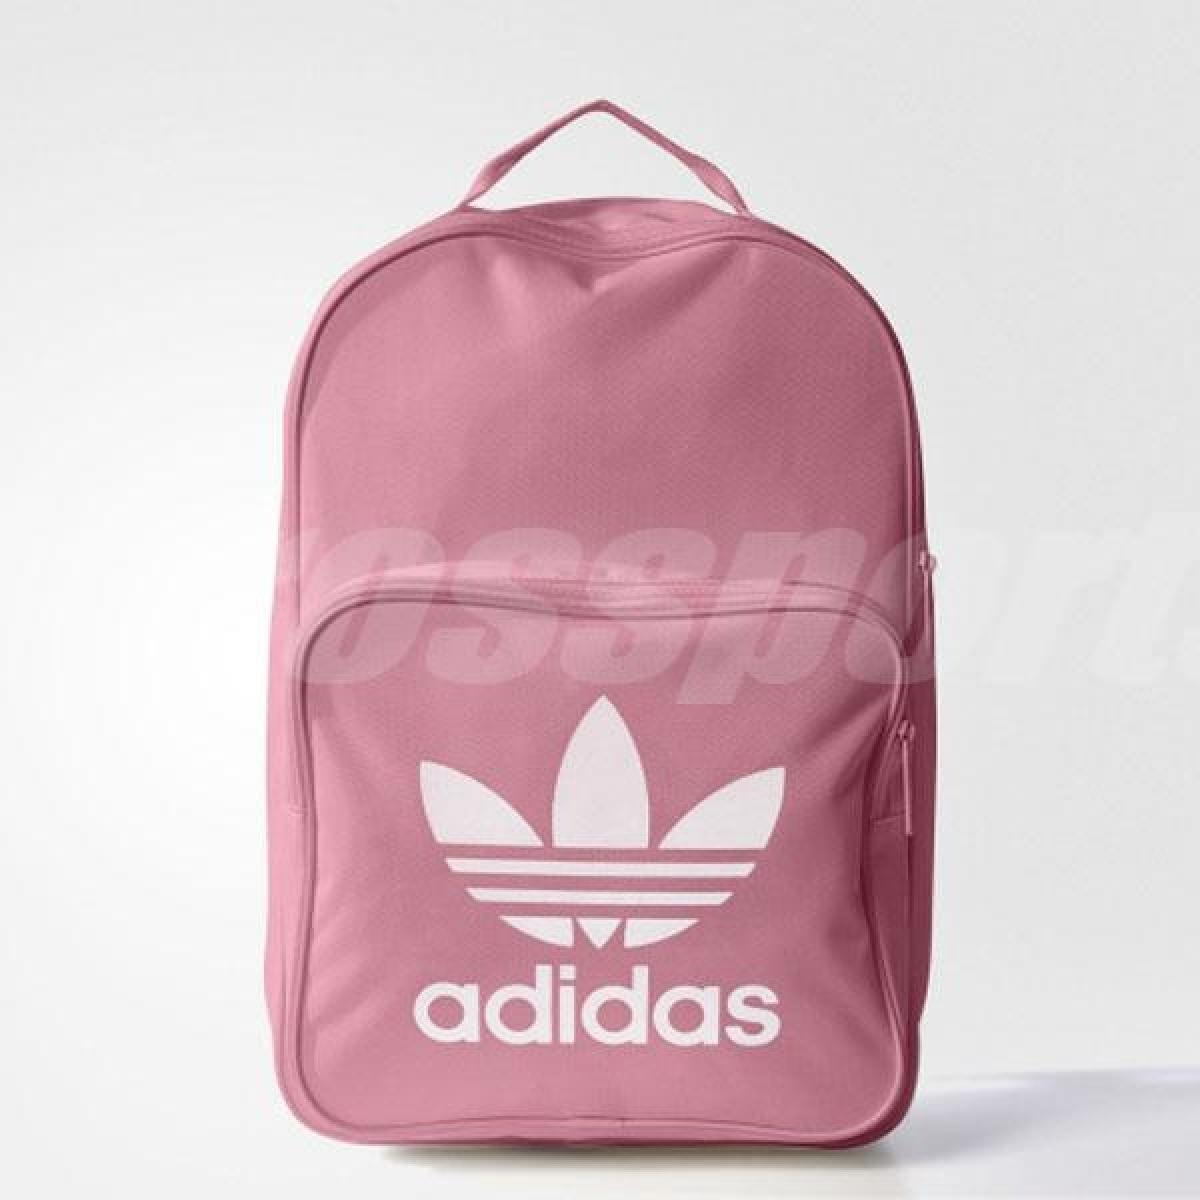 adidas後背包Tricot Classic Backpack三葉草Logo粉紅白女款包包基本款PUMP306 BK6725